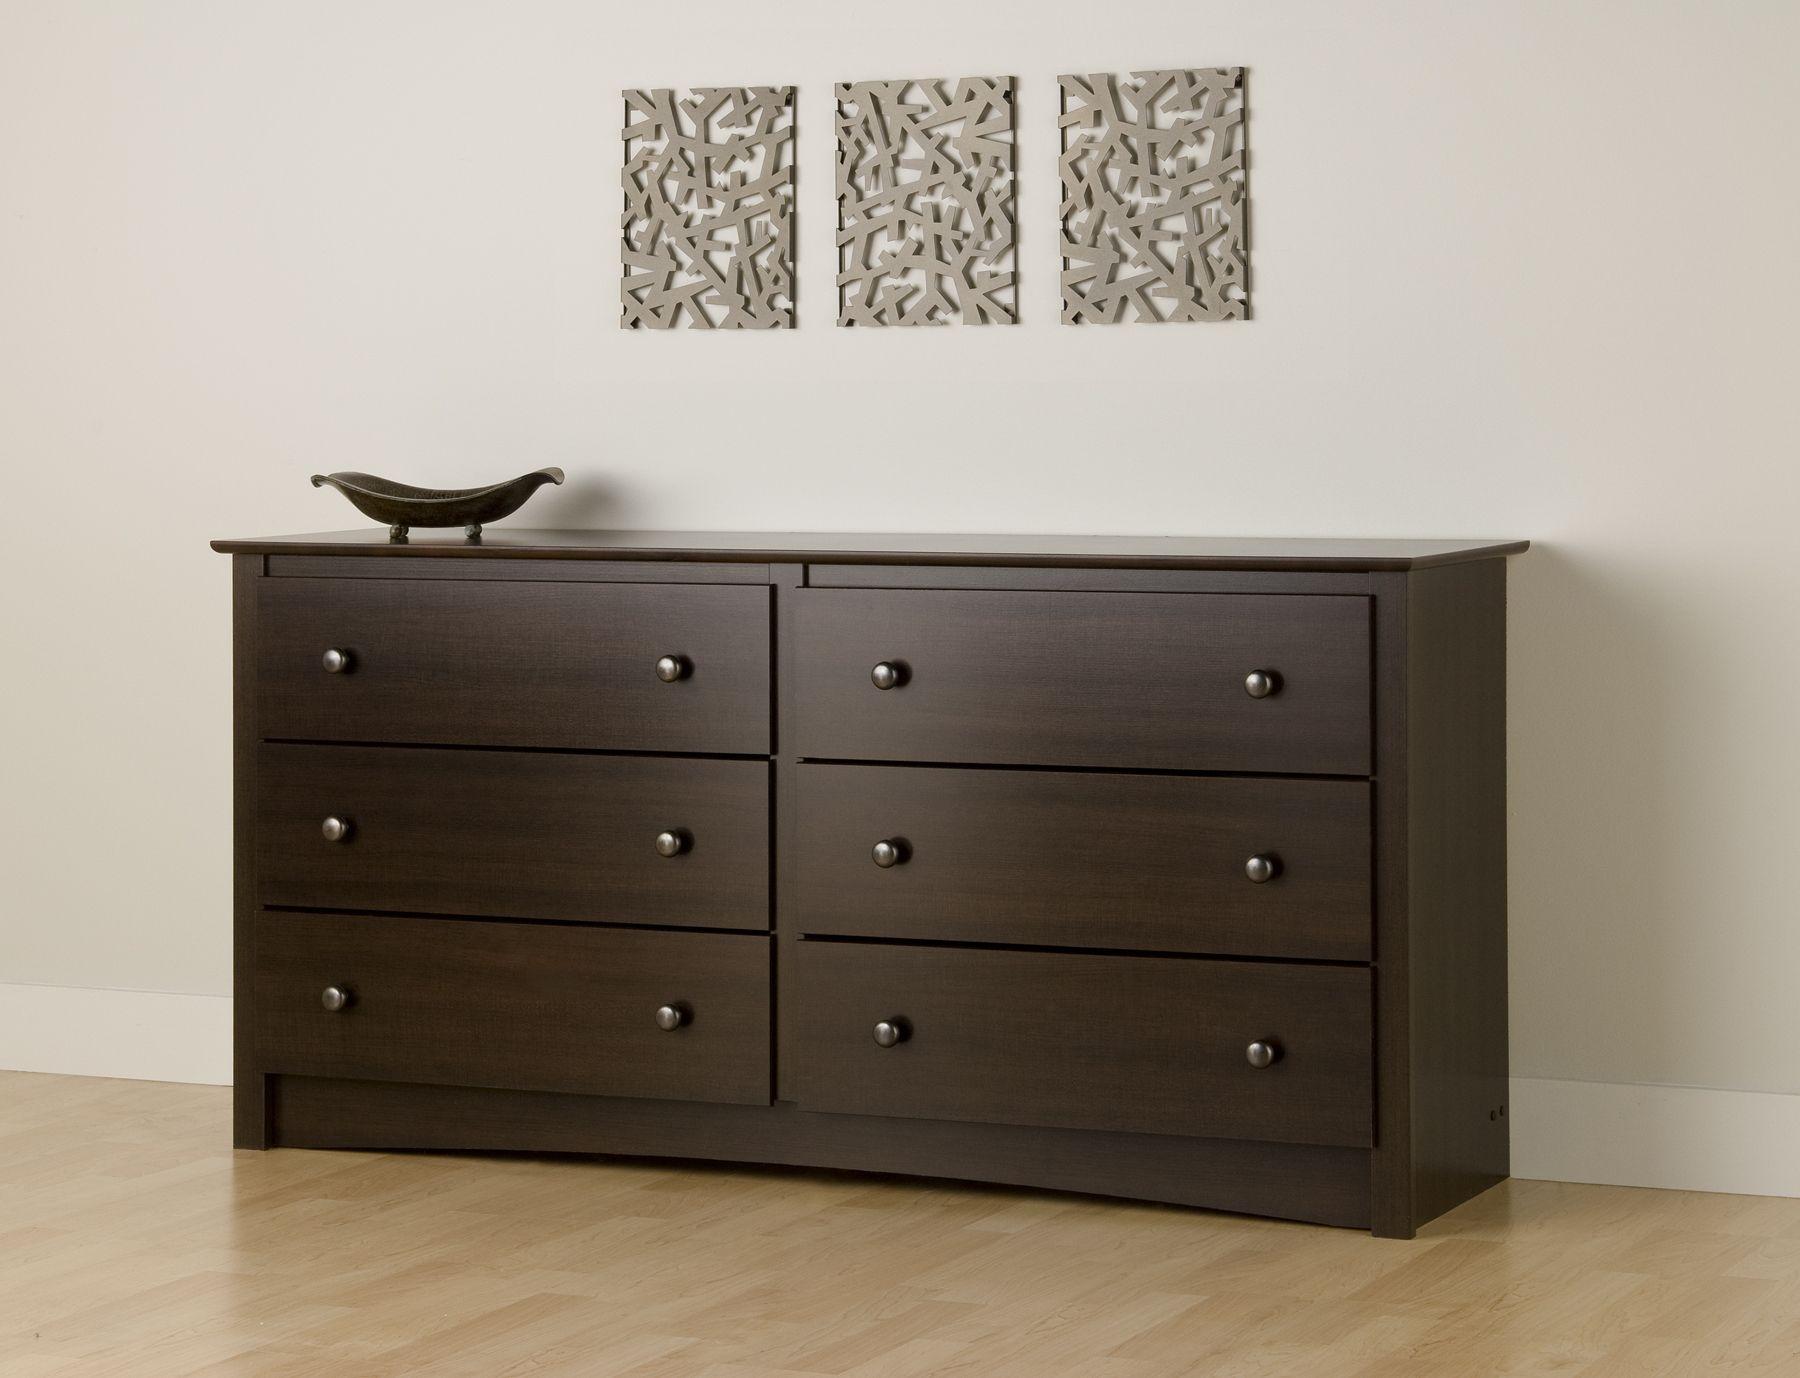 Prepac Fremont 6 Drawer Dresser